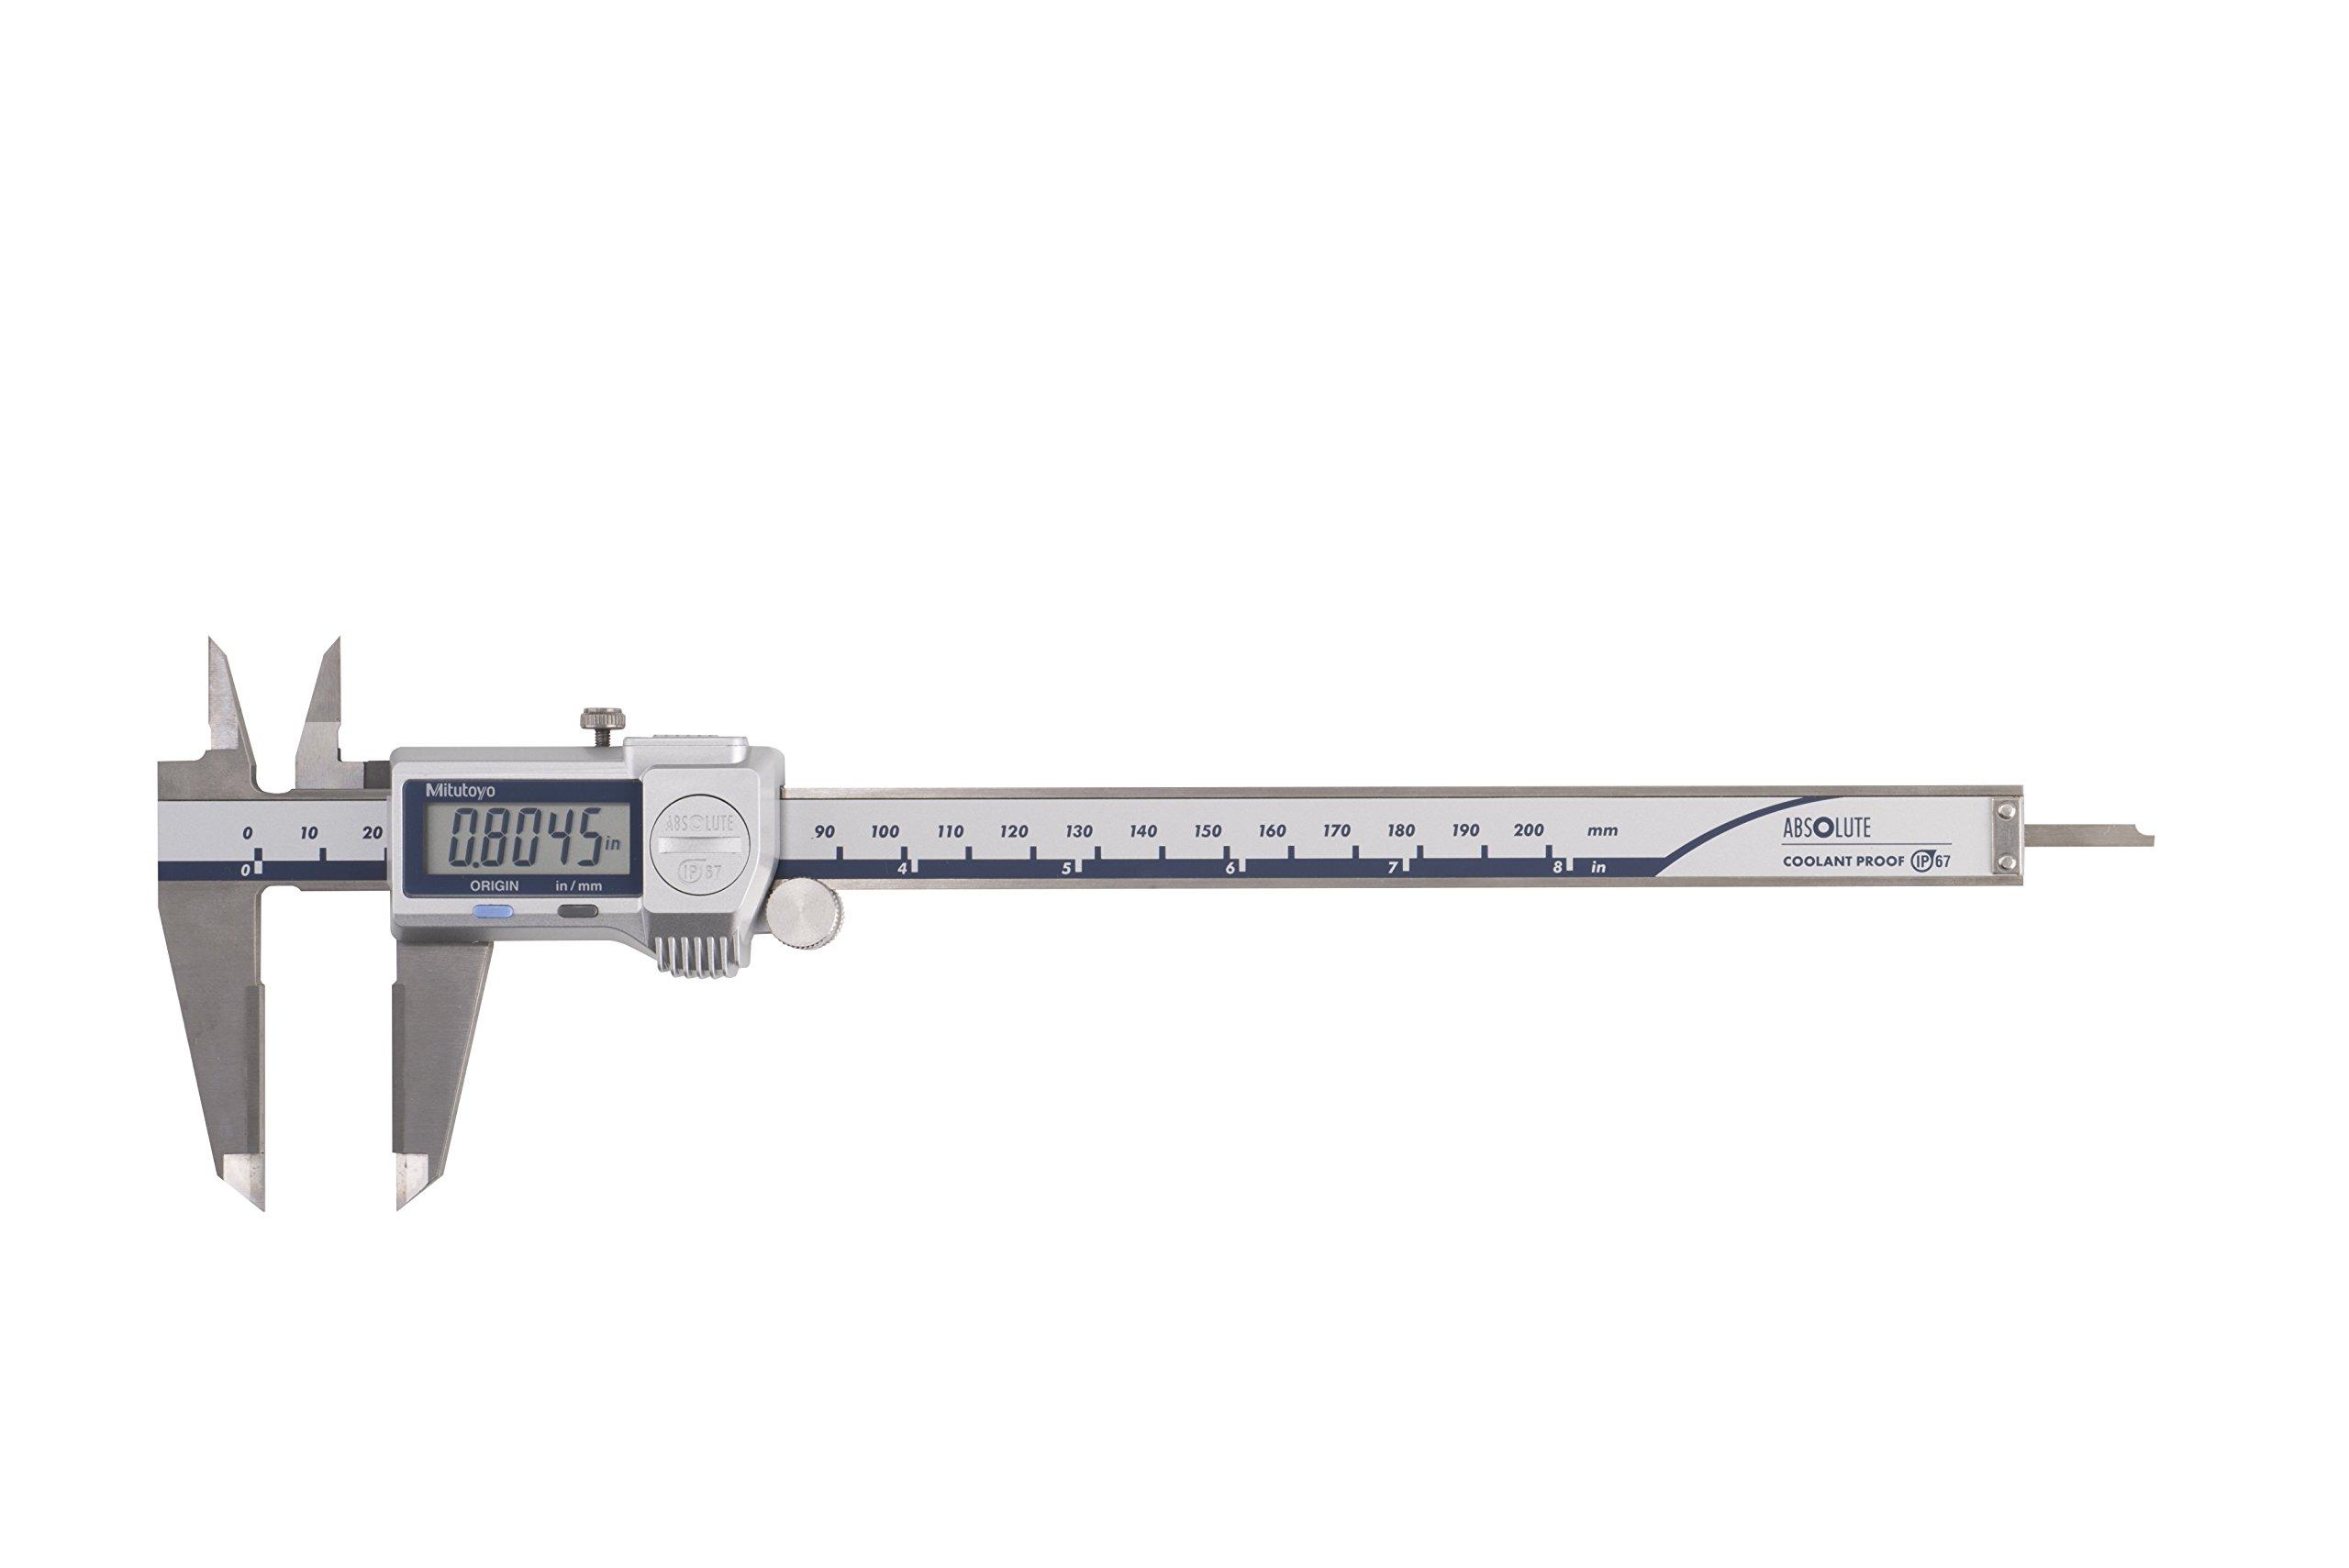 Mitutoyo 500-738-20 Digimatic Caliper with Statistical Process Control, Carbide OD/ID, 0-8'', IP67, 0.0005''/0.01 mm